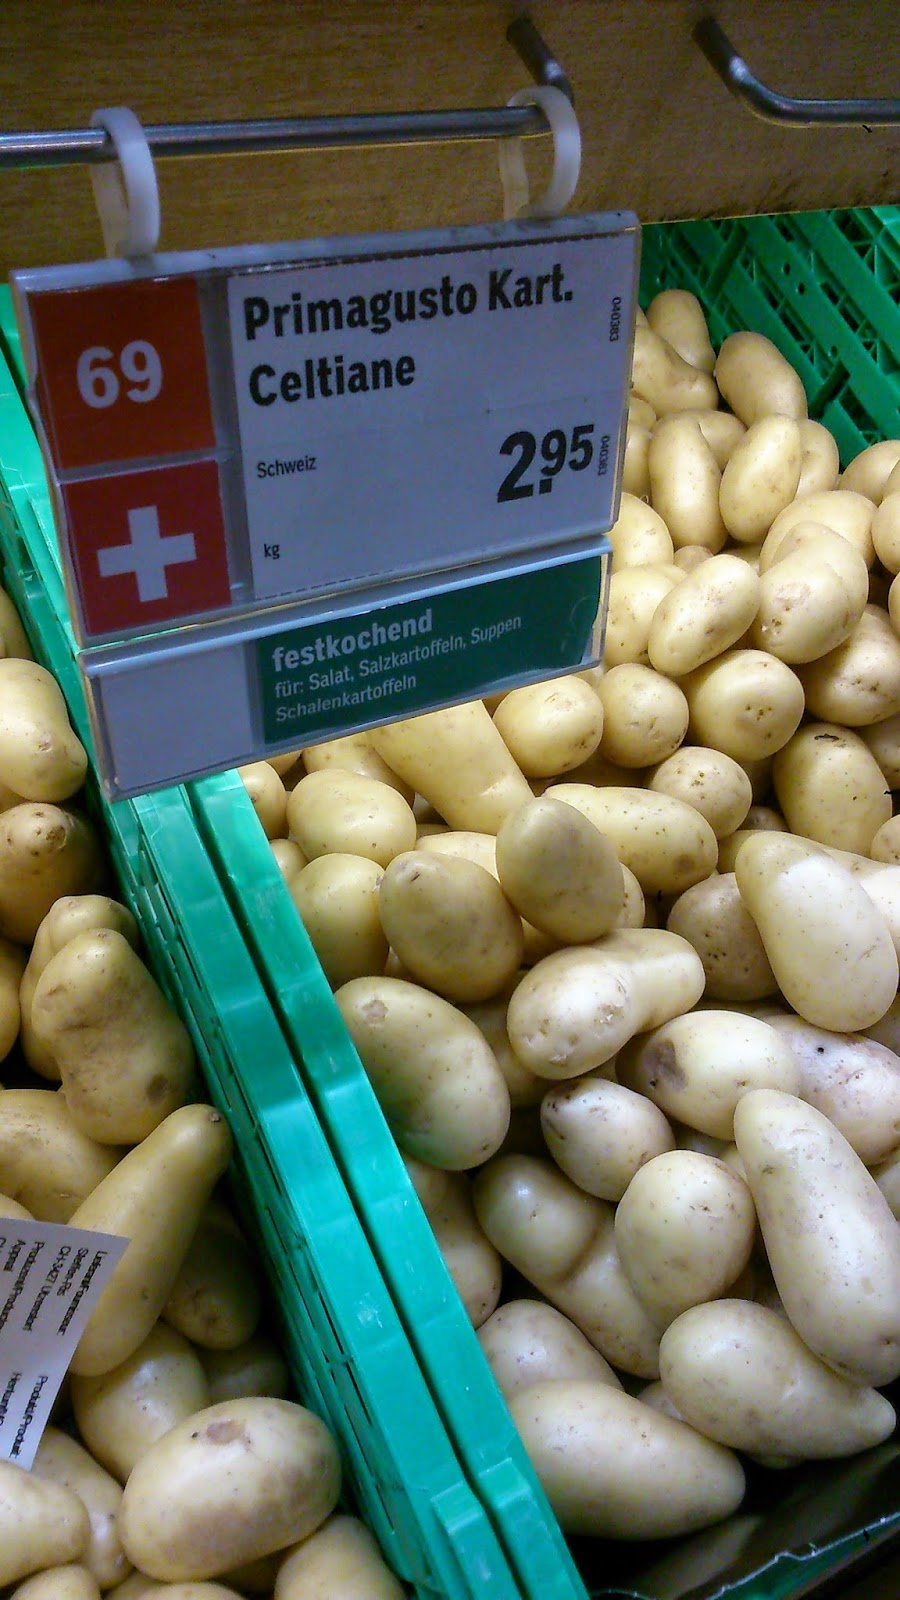 1 kg potatis hur många